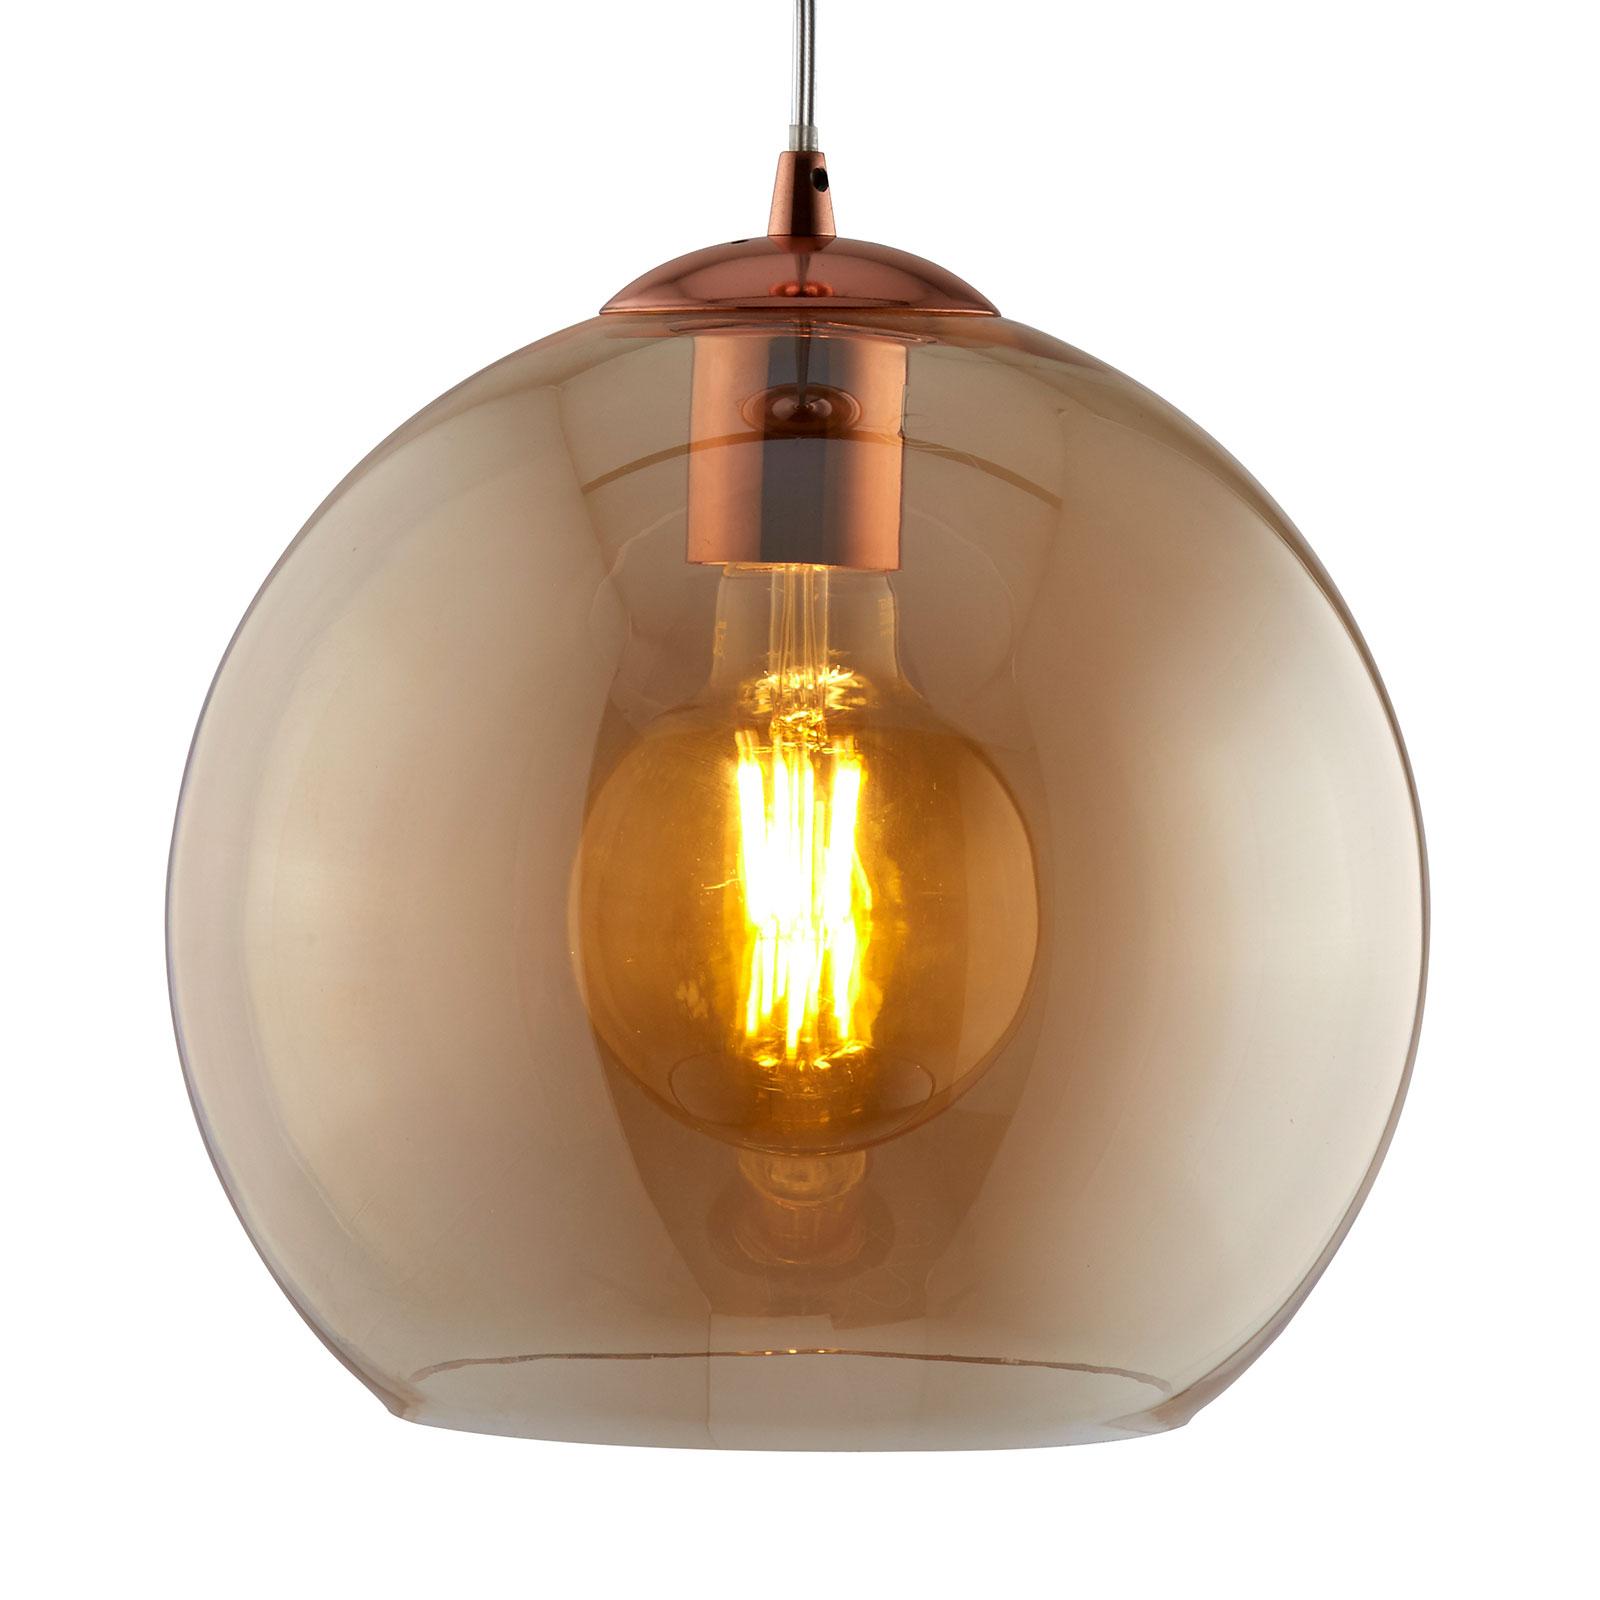 Lampa wisząca Balls, szklane kule bursztyn 35cm